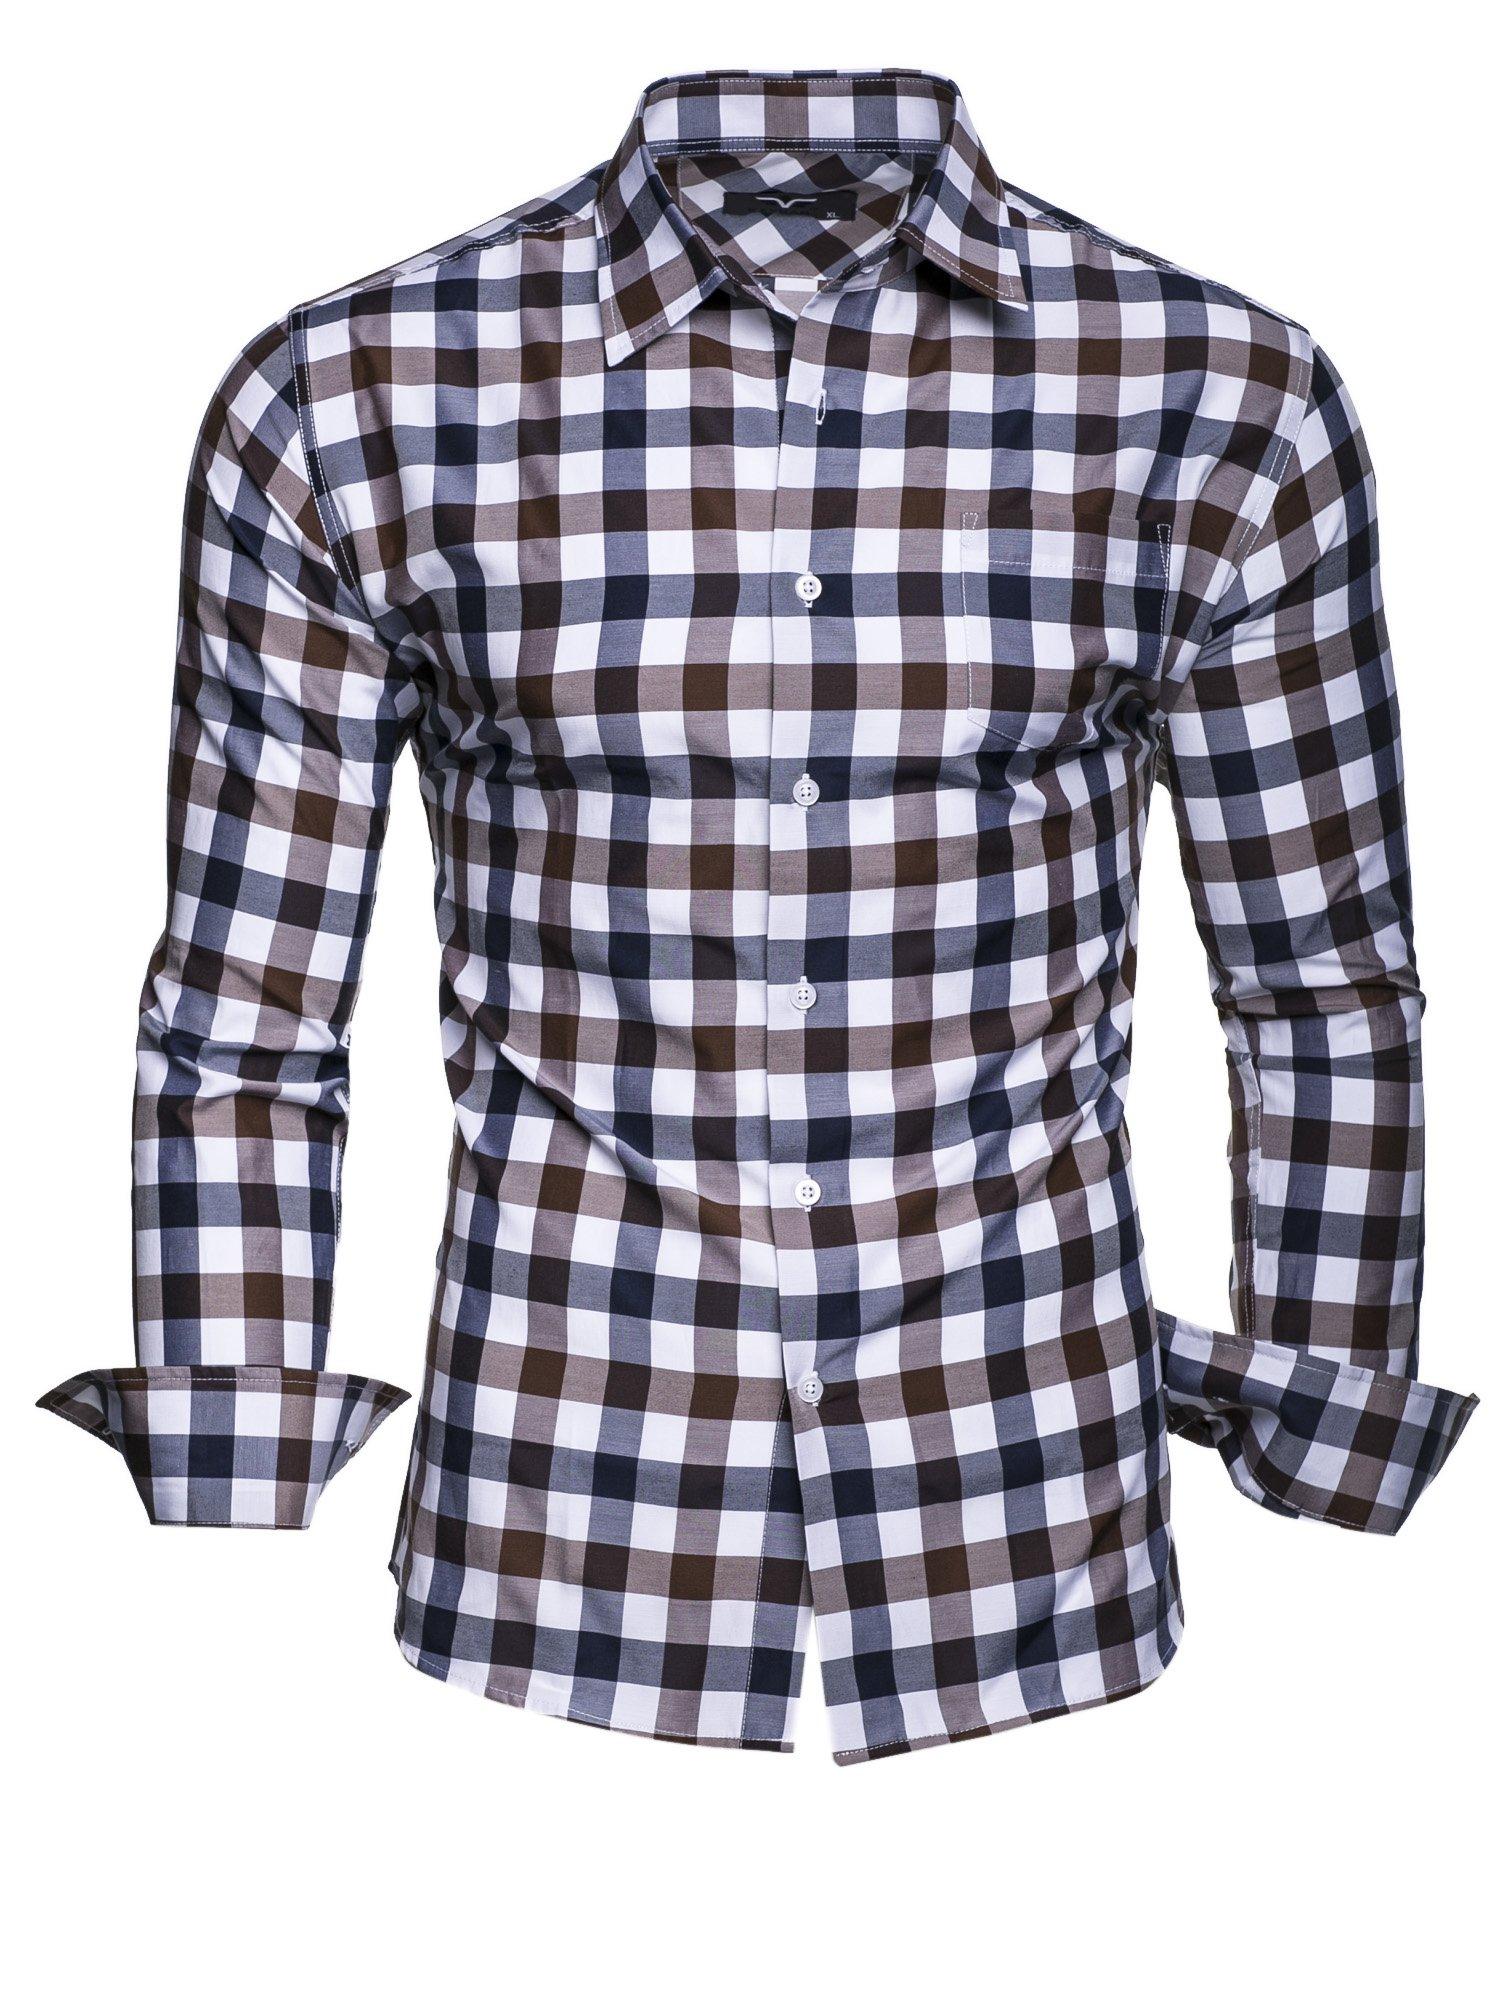 6XL Modello Monaco Kayhan Hombre Camisa Manga Larga Slim Fit S